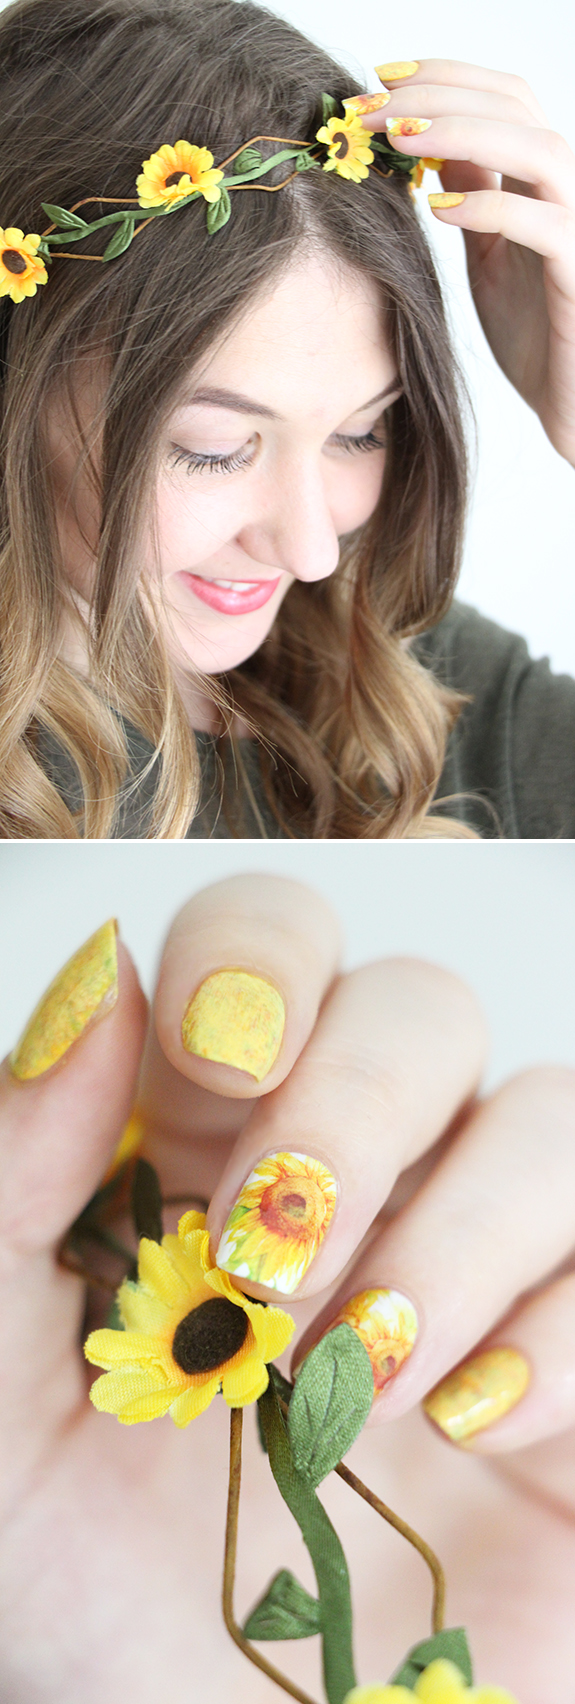 sunflower-nails-4